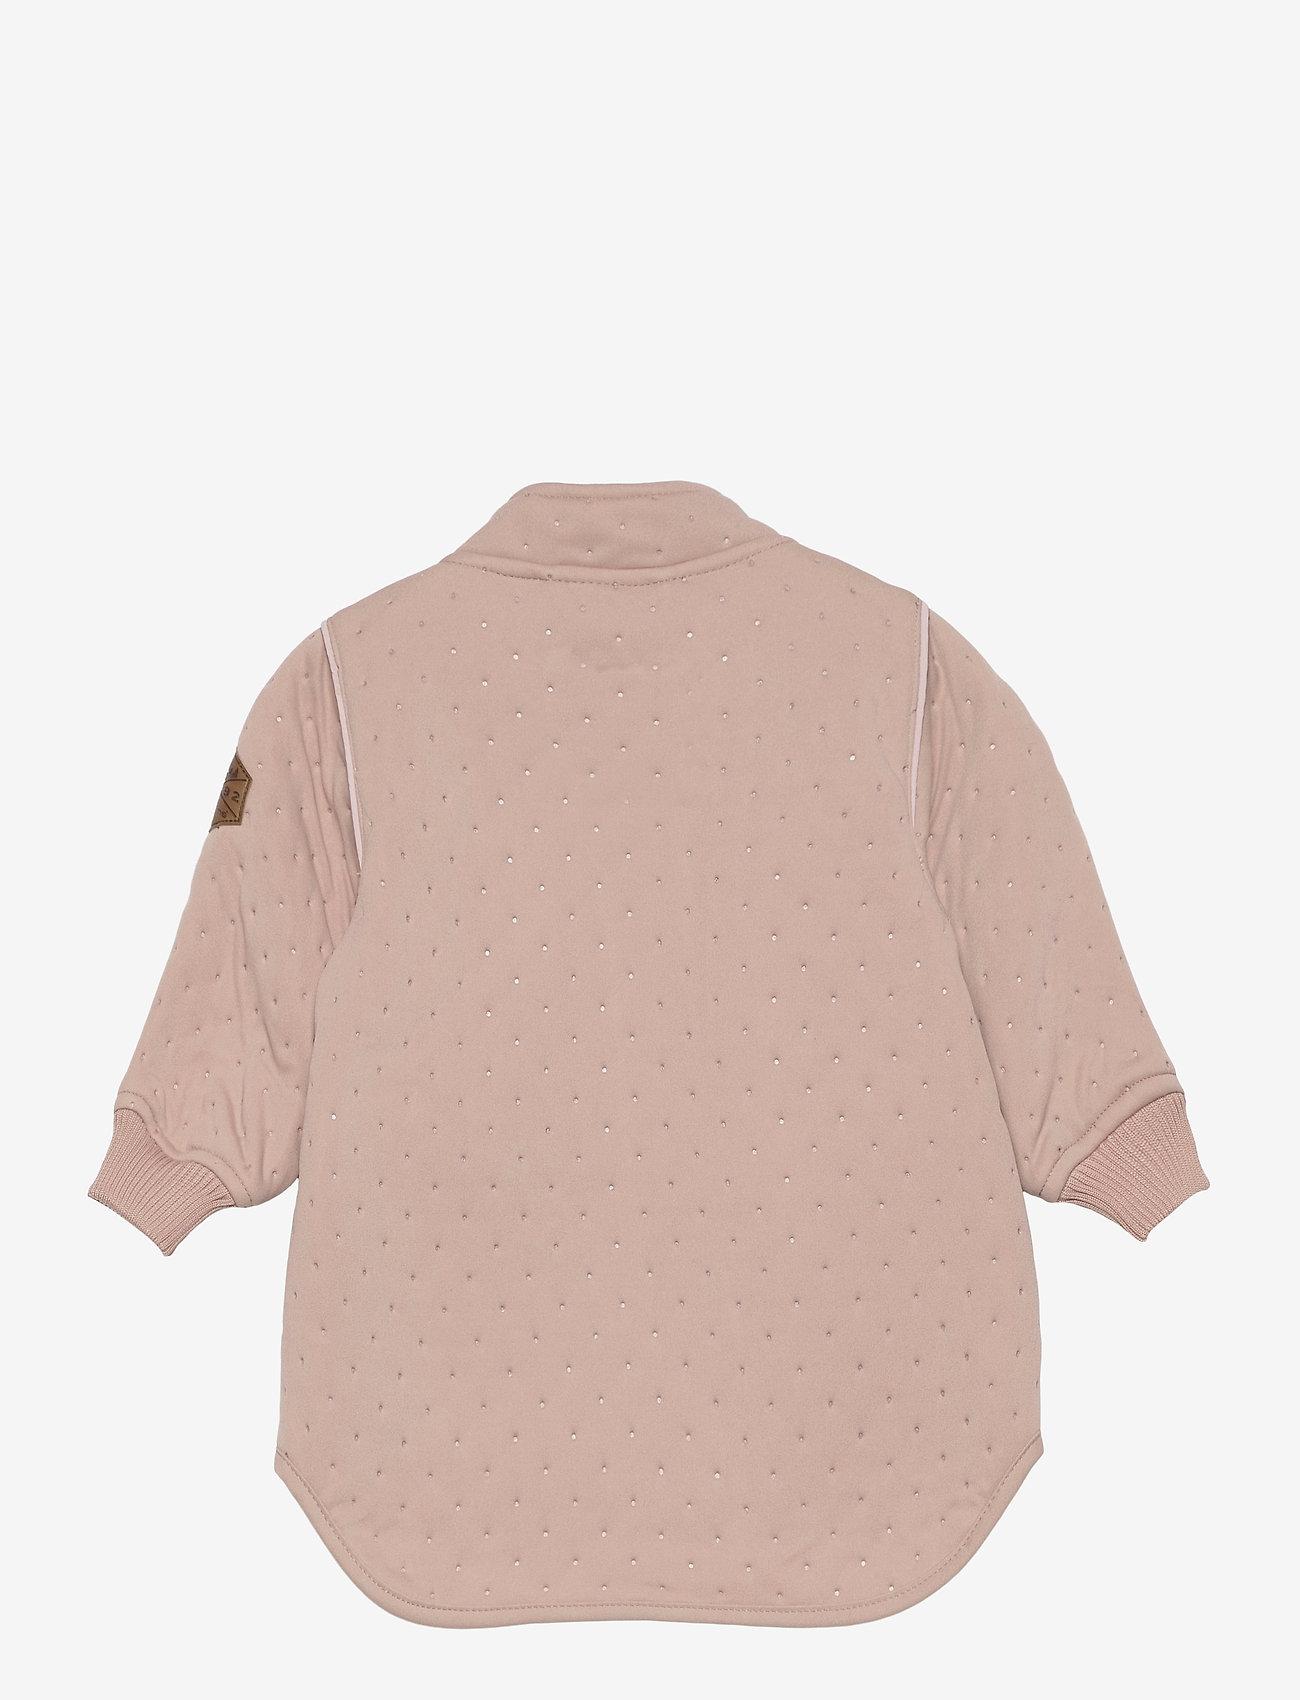 Mikk-Line - Soft Thermo Recycled Girl Jacket - termojakke - adobe rose - 1